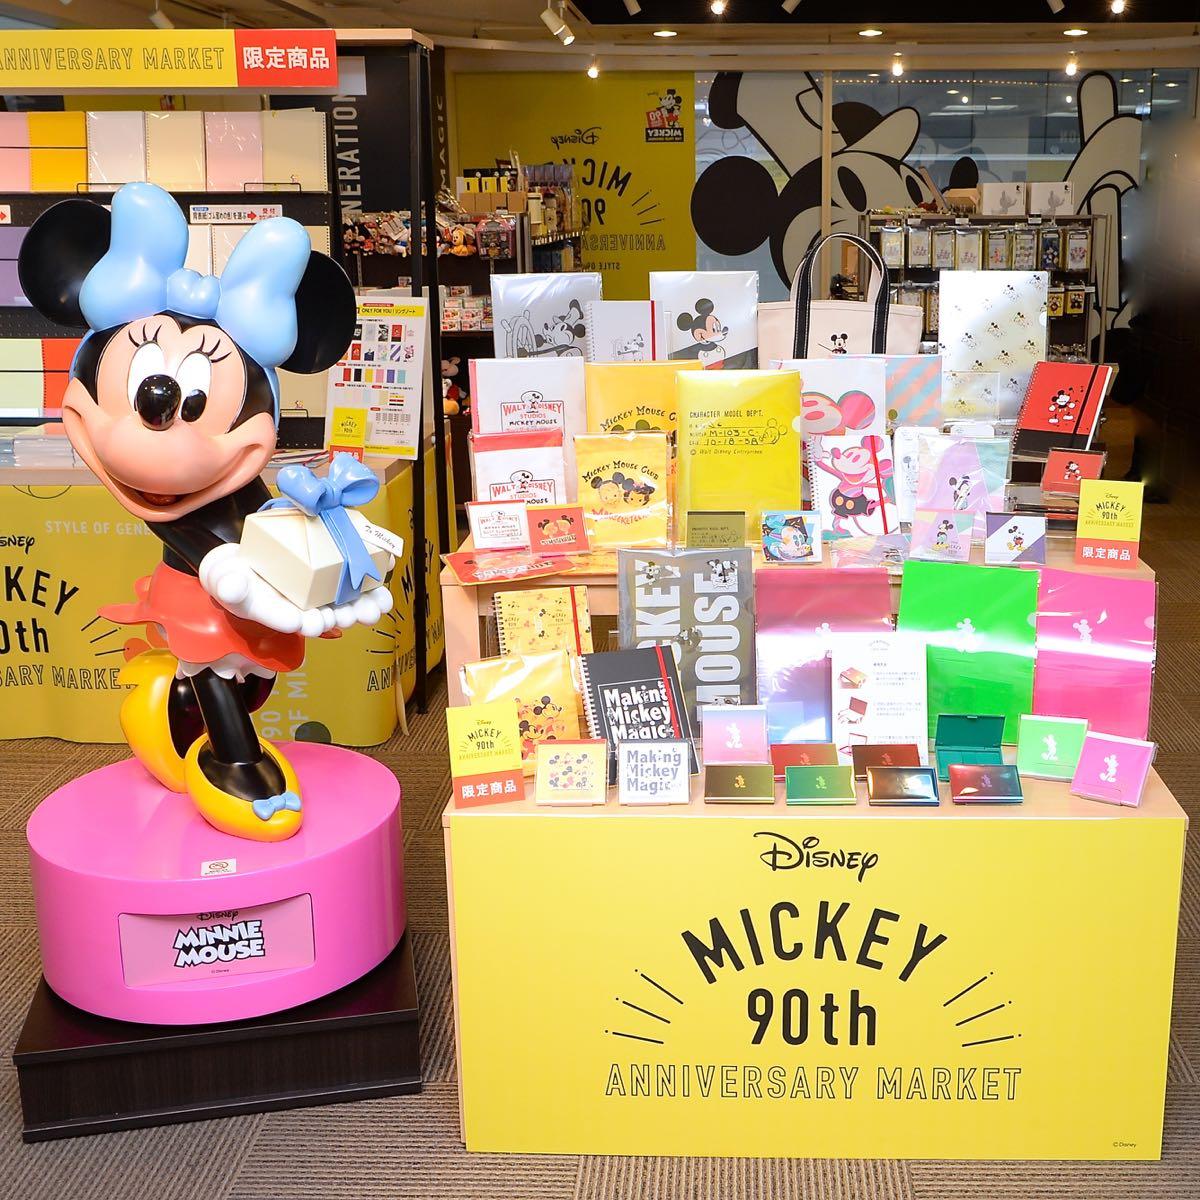 Disney MICKEY 90th ANNIVERSARY MARKET ~STYLE OF GENERATION~ 集合